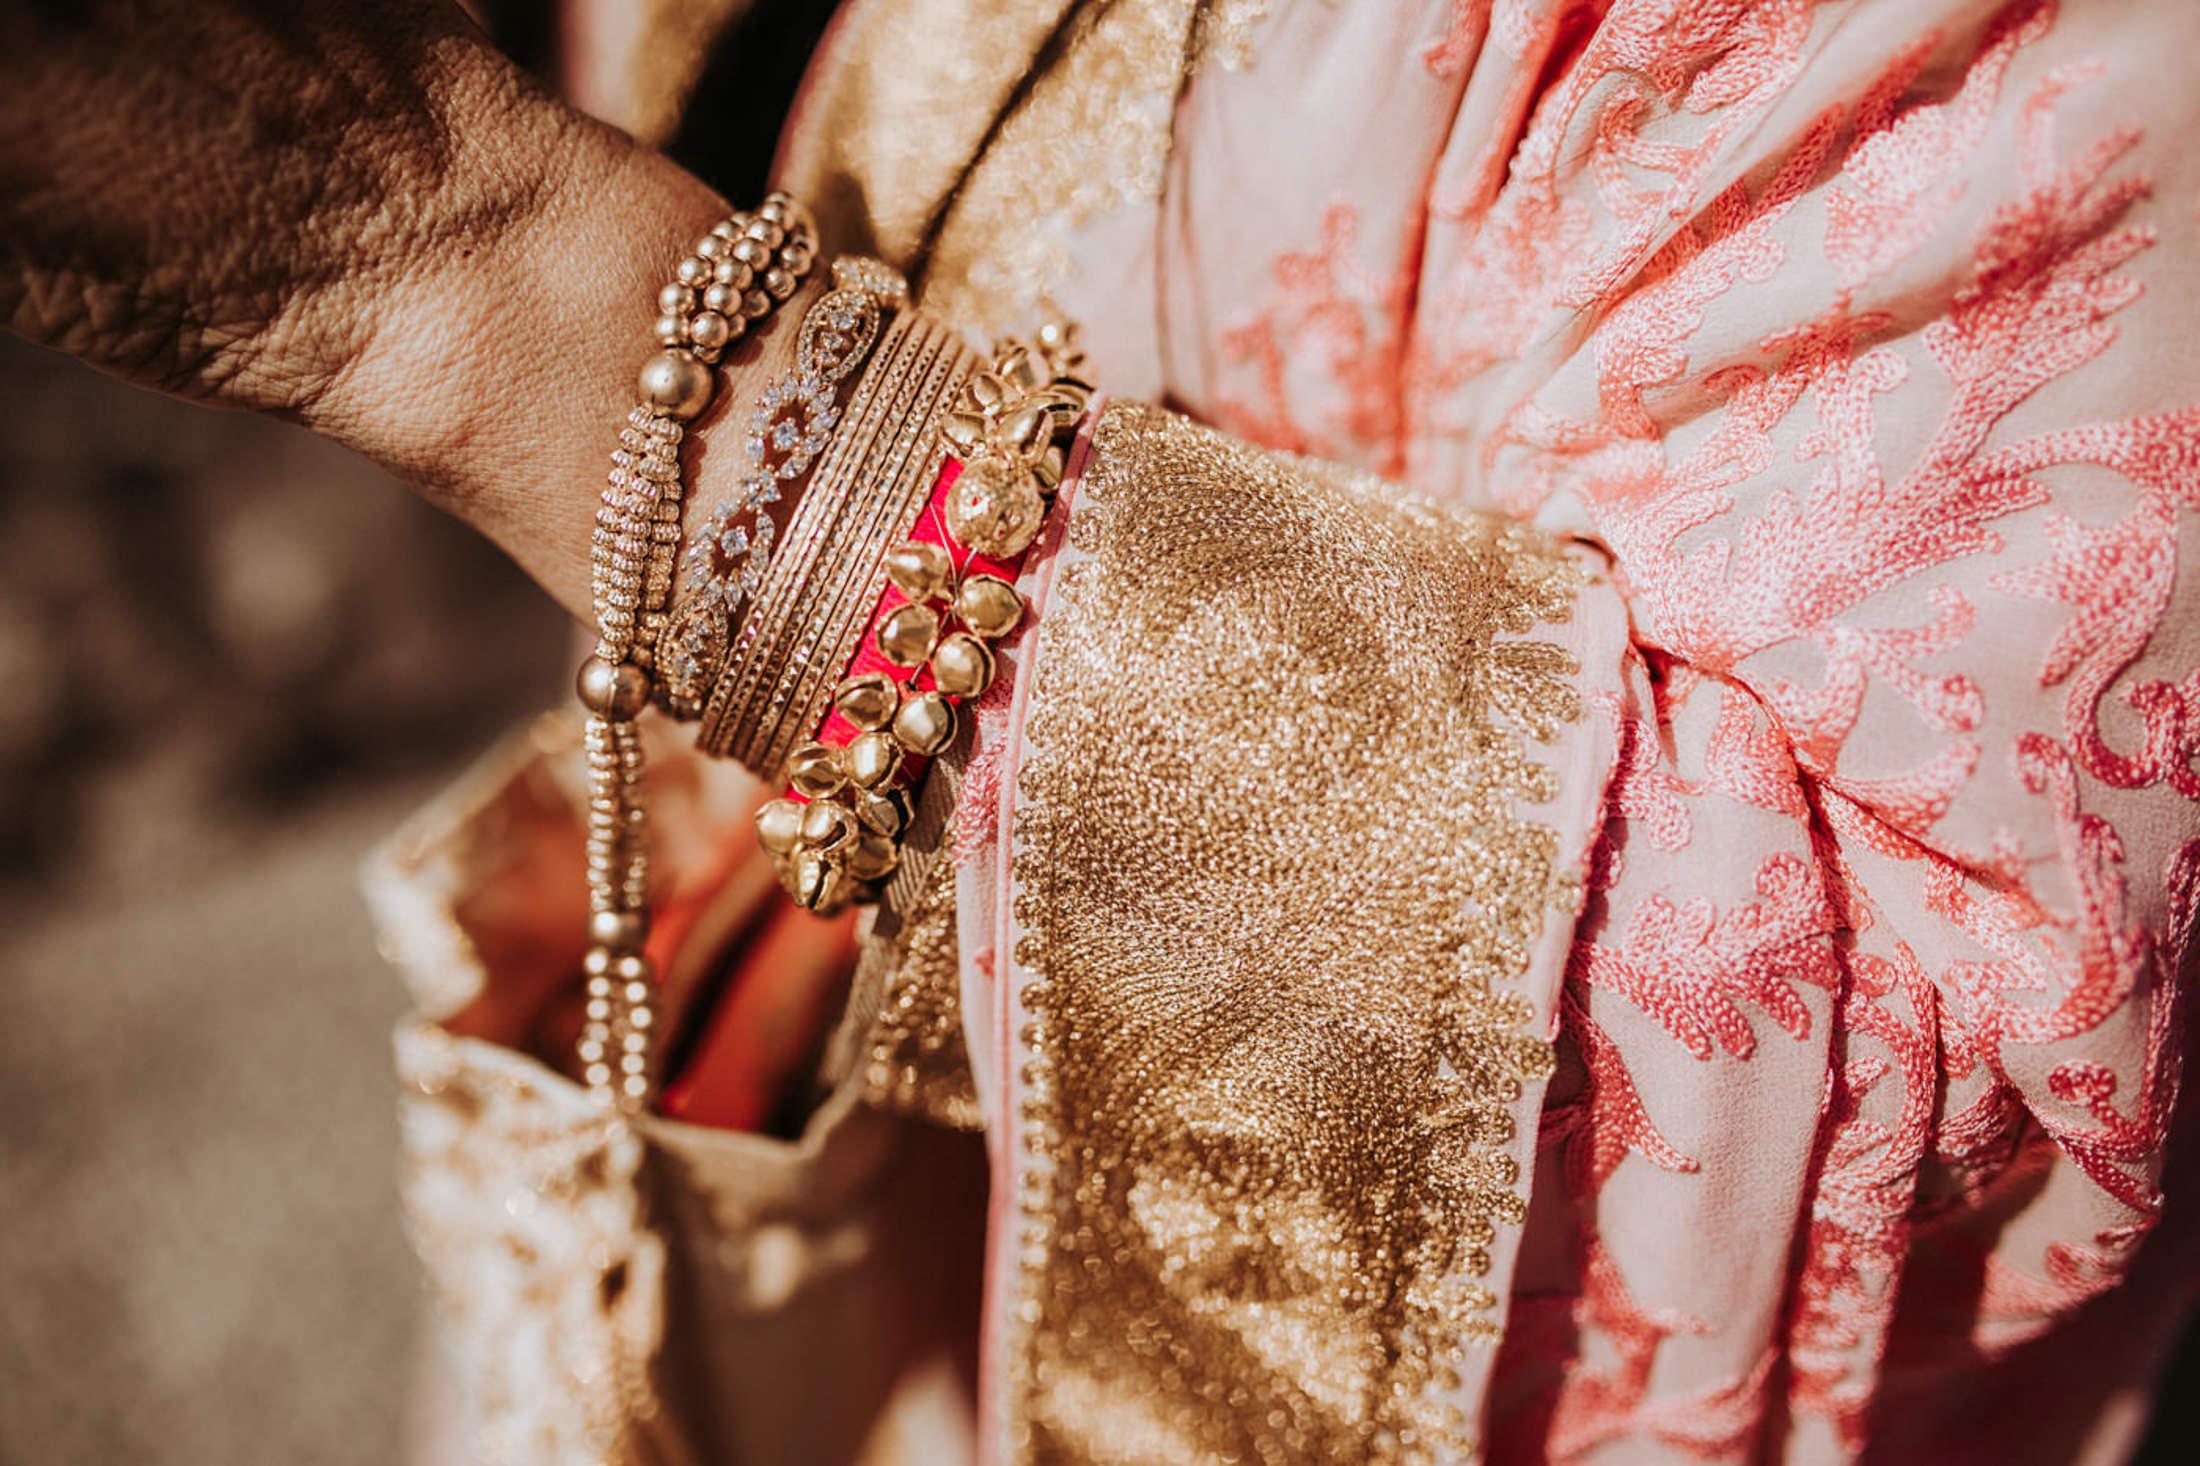 Wedding_Photographer_Mallorca_Daniela-Marquardt_Photography_New_York_Iceland_Tuscany_Santorini_Portugal_Austria_Bavaria_Elopement_Hochzeitsfotograf_AntjeRajat2_27